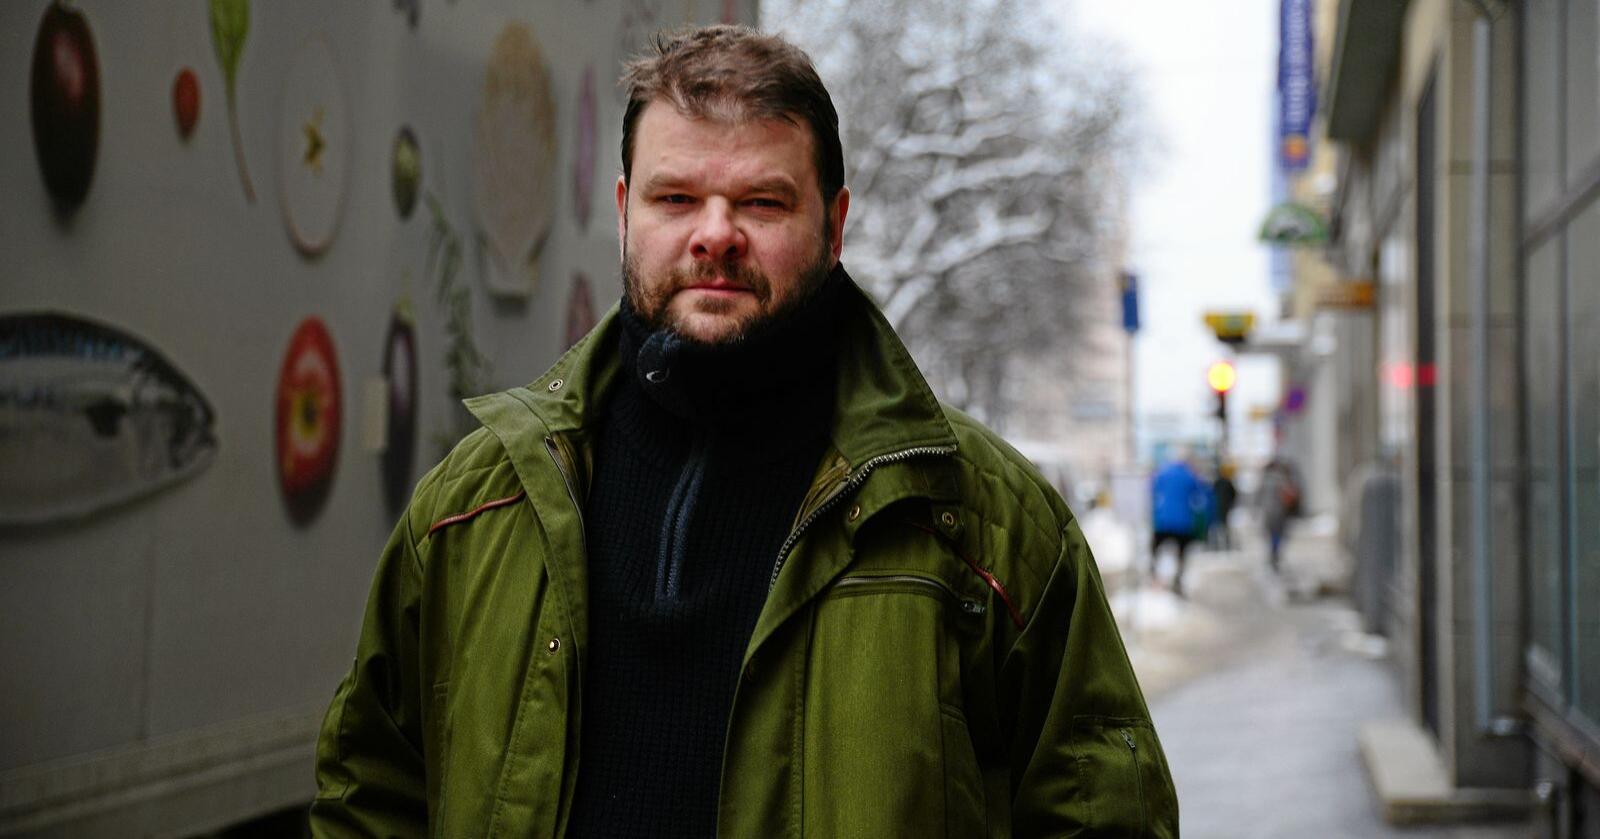 Fredrik Mellem er generalsekretær i Europabevegelsen. Foto: Siri Juell Rasmussen